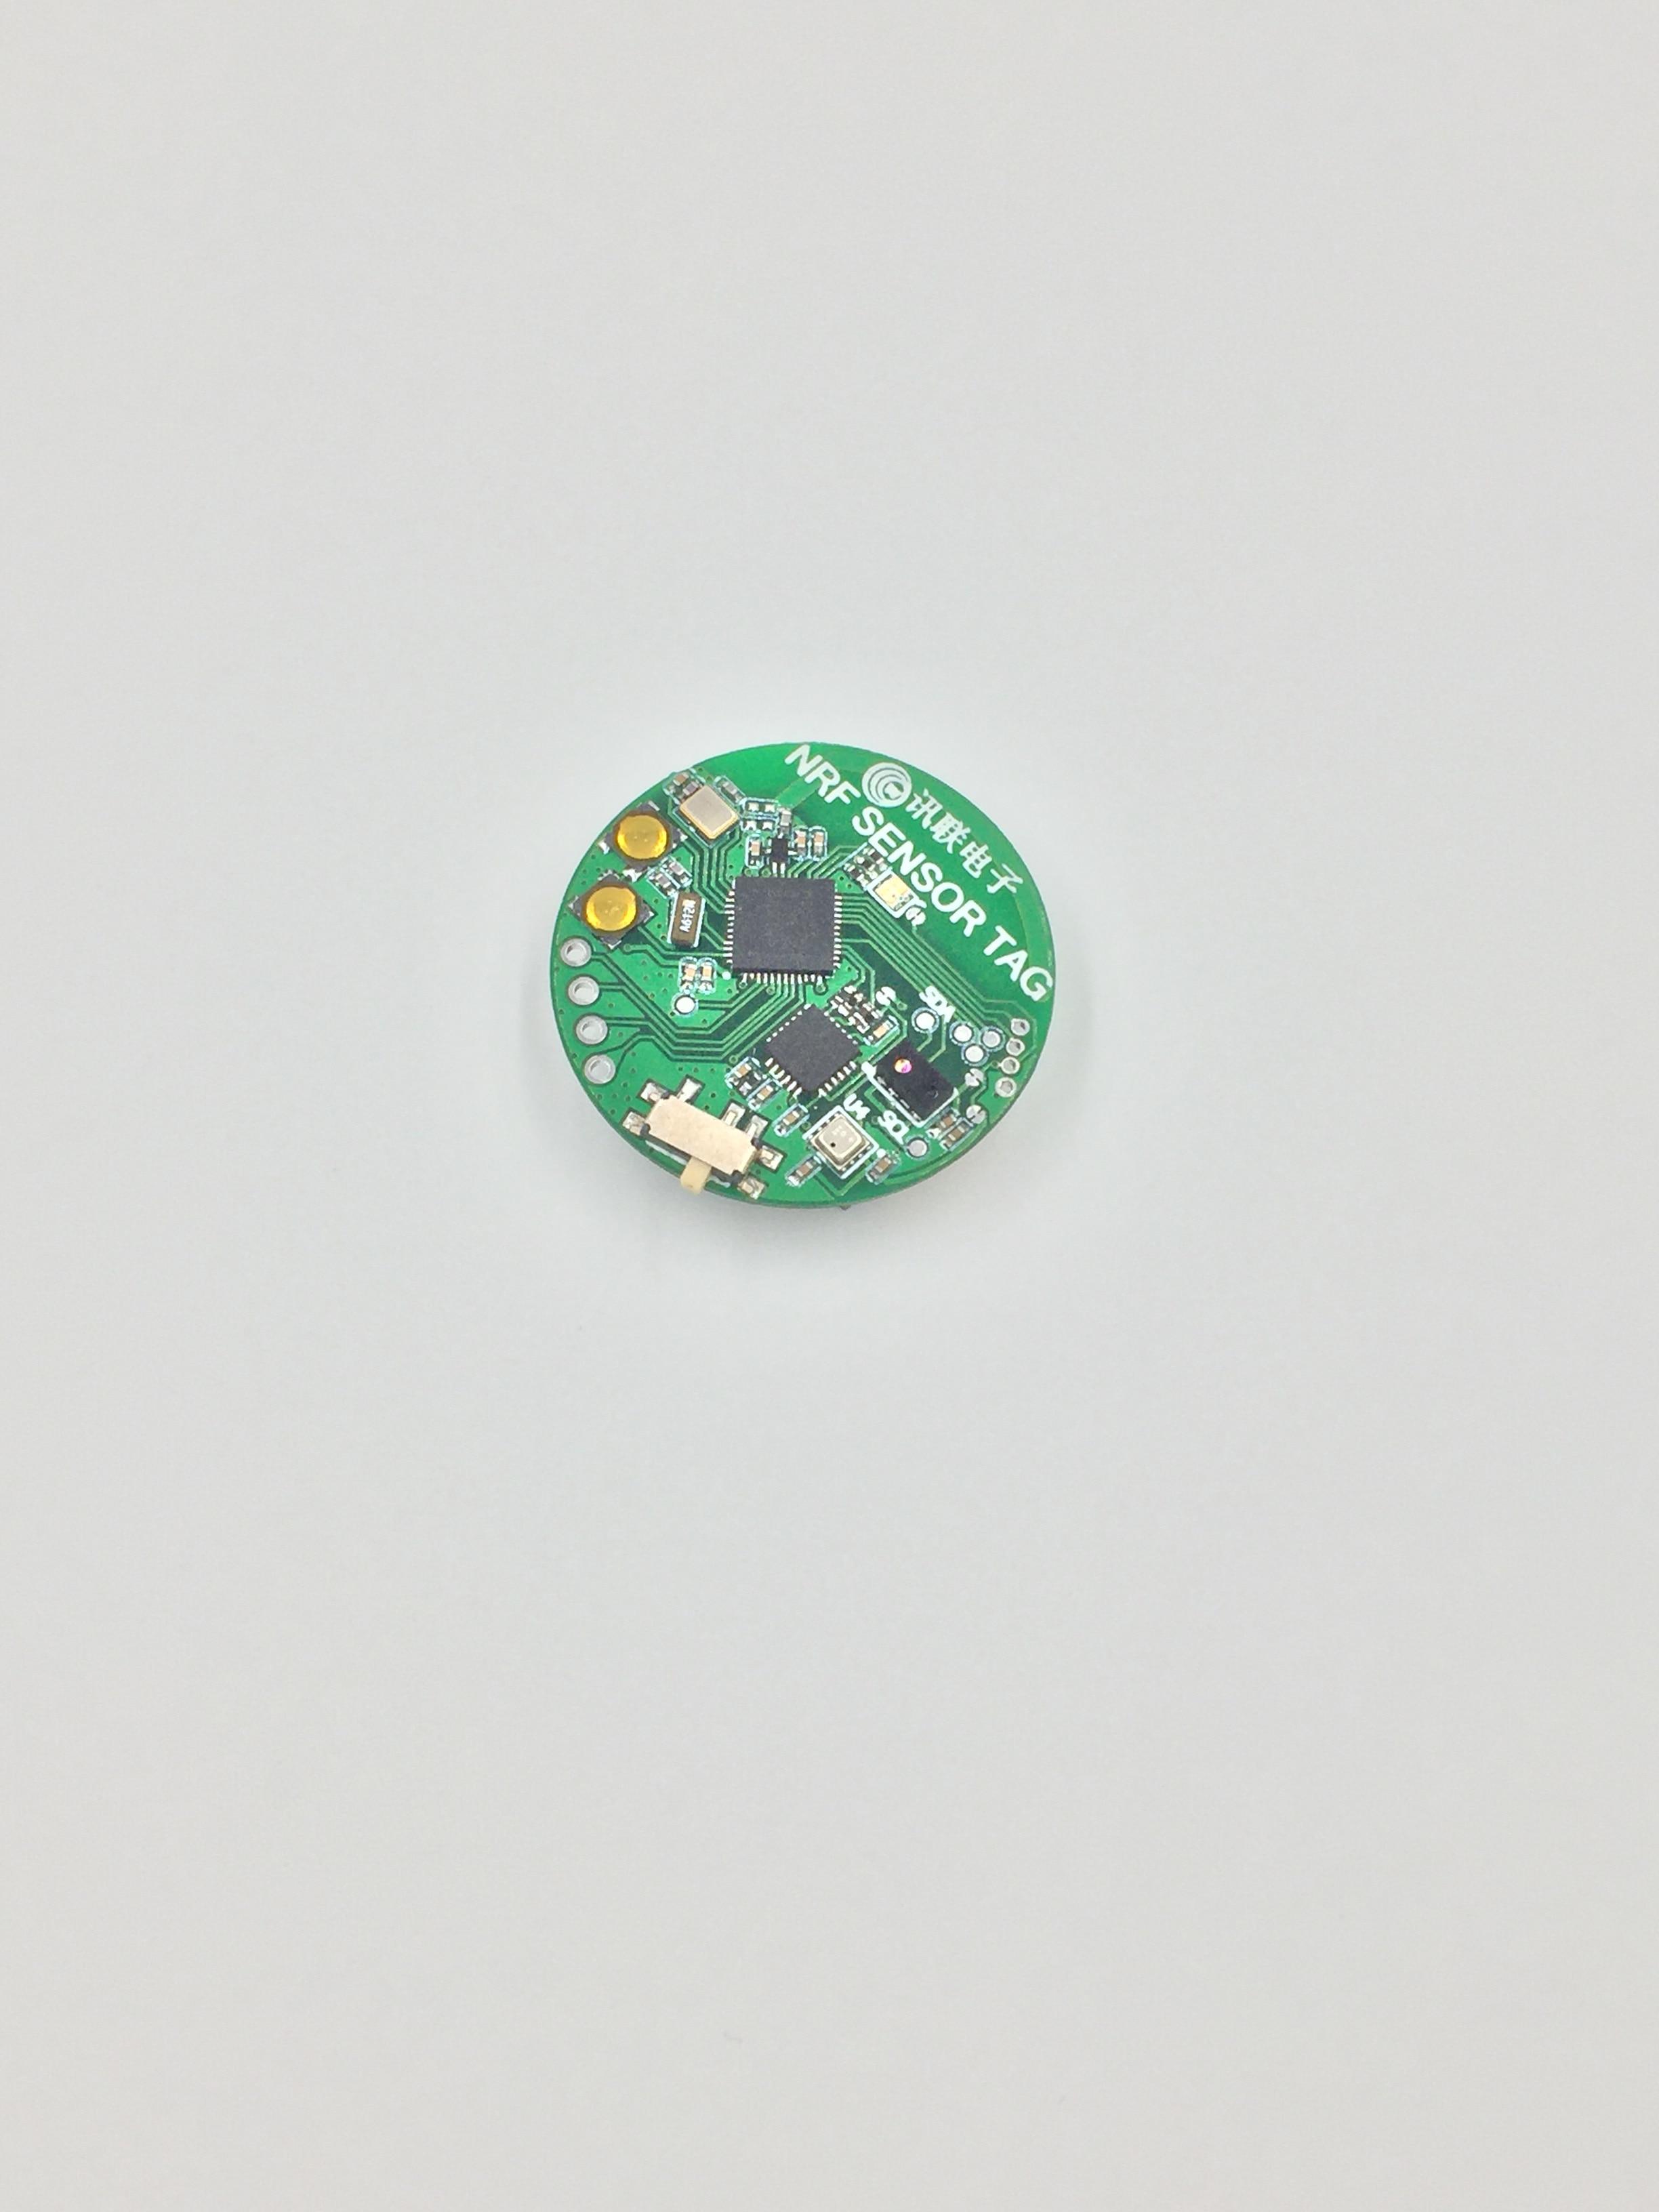 Bluetooth 4 Temperature, Pressure and Humidity Sensors, Acceleration Gyro, Ambient Light Sensor BME280 rcmall bme280 pressure humidity temperature barometric pressure altitude sensor module with iic i2c for arduino fz1639